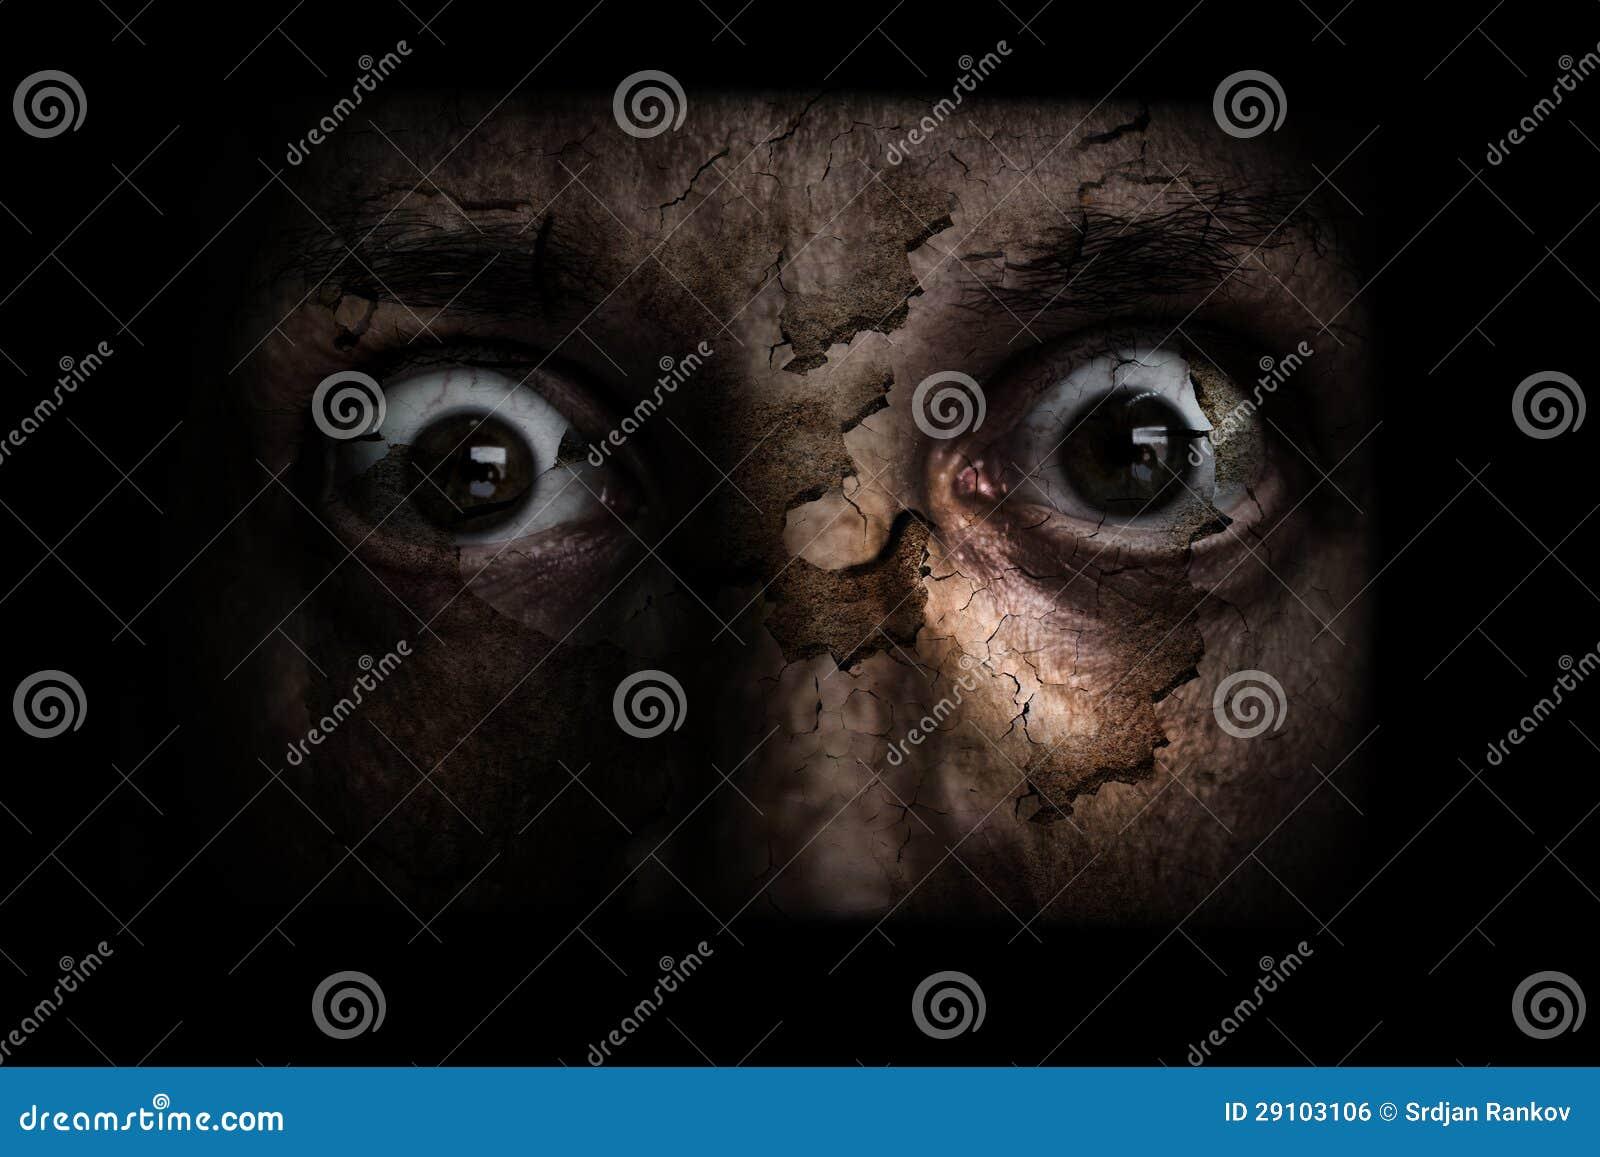 Demonic ugly face